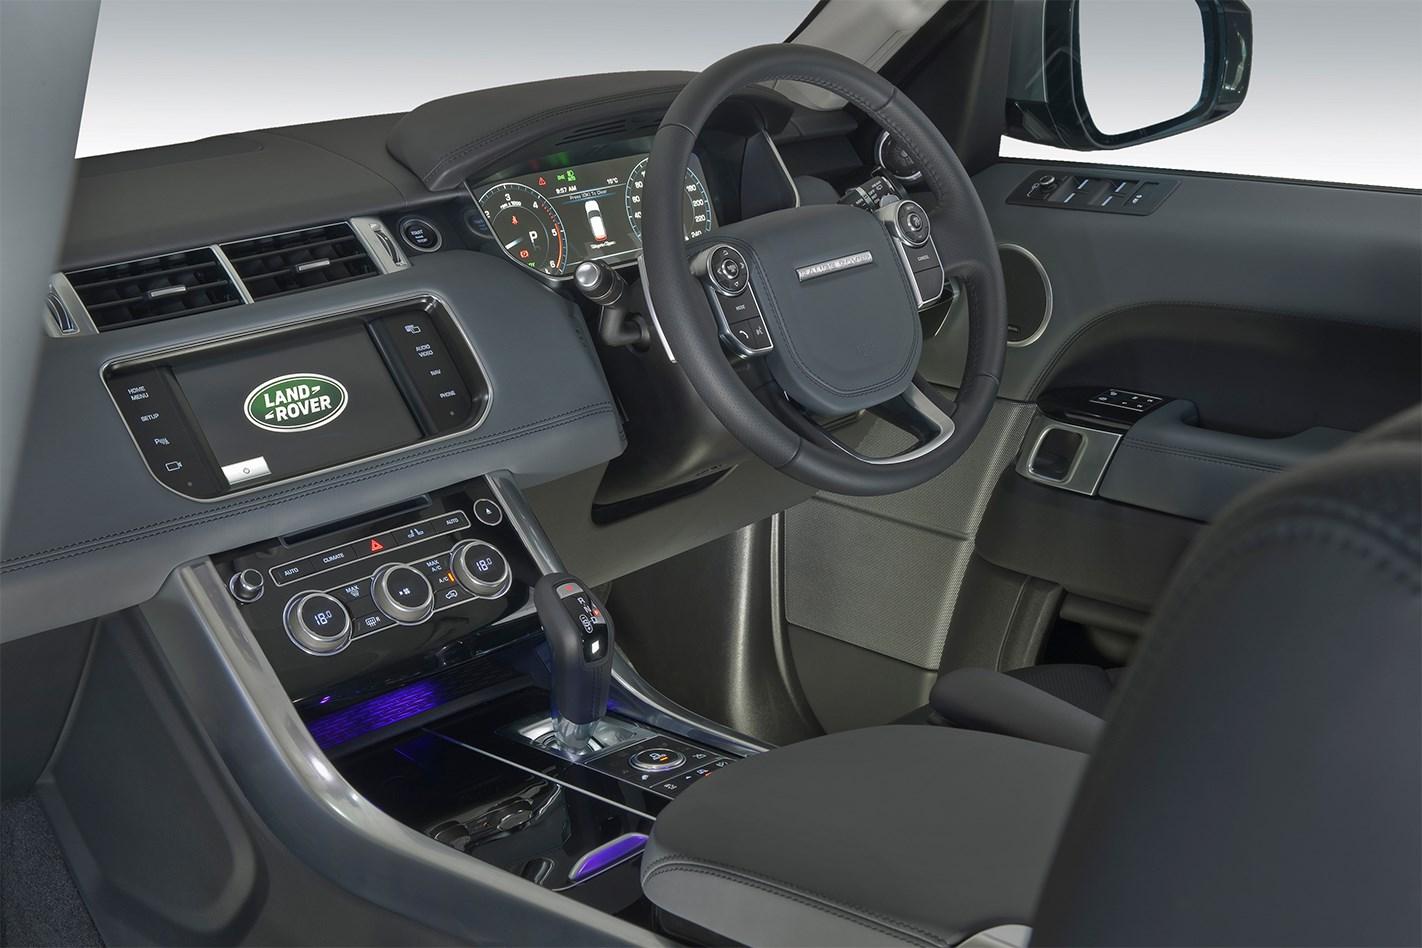 Range rover evoque interior ambient lighting awesome home for Range rover sport interior lighting